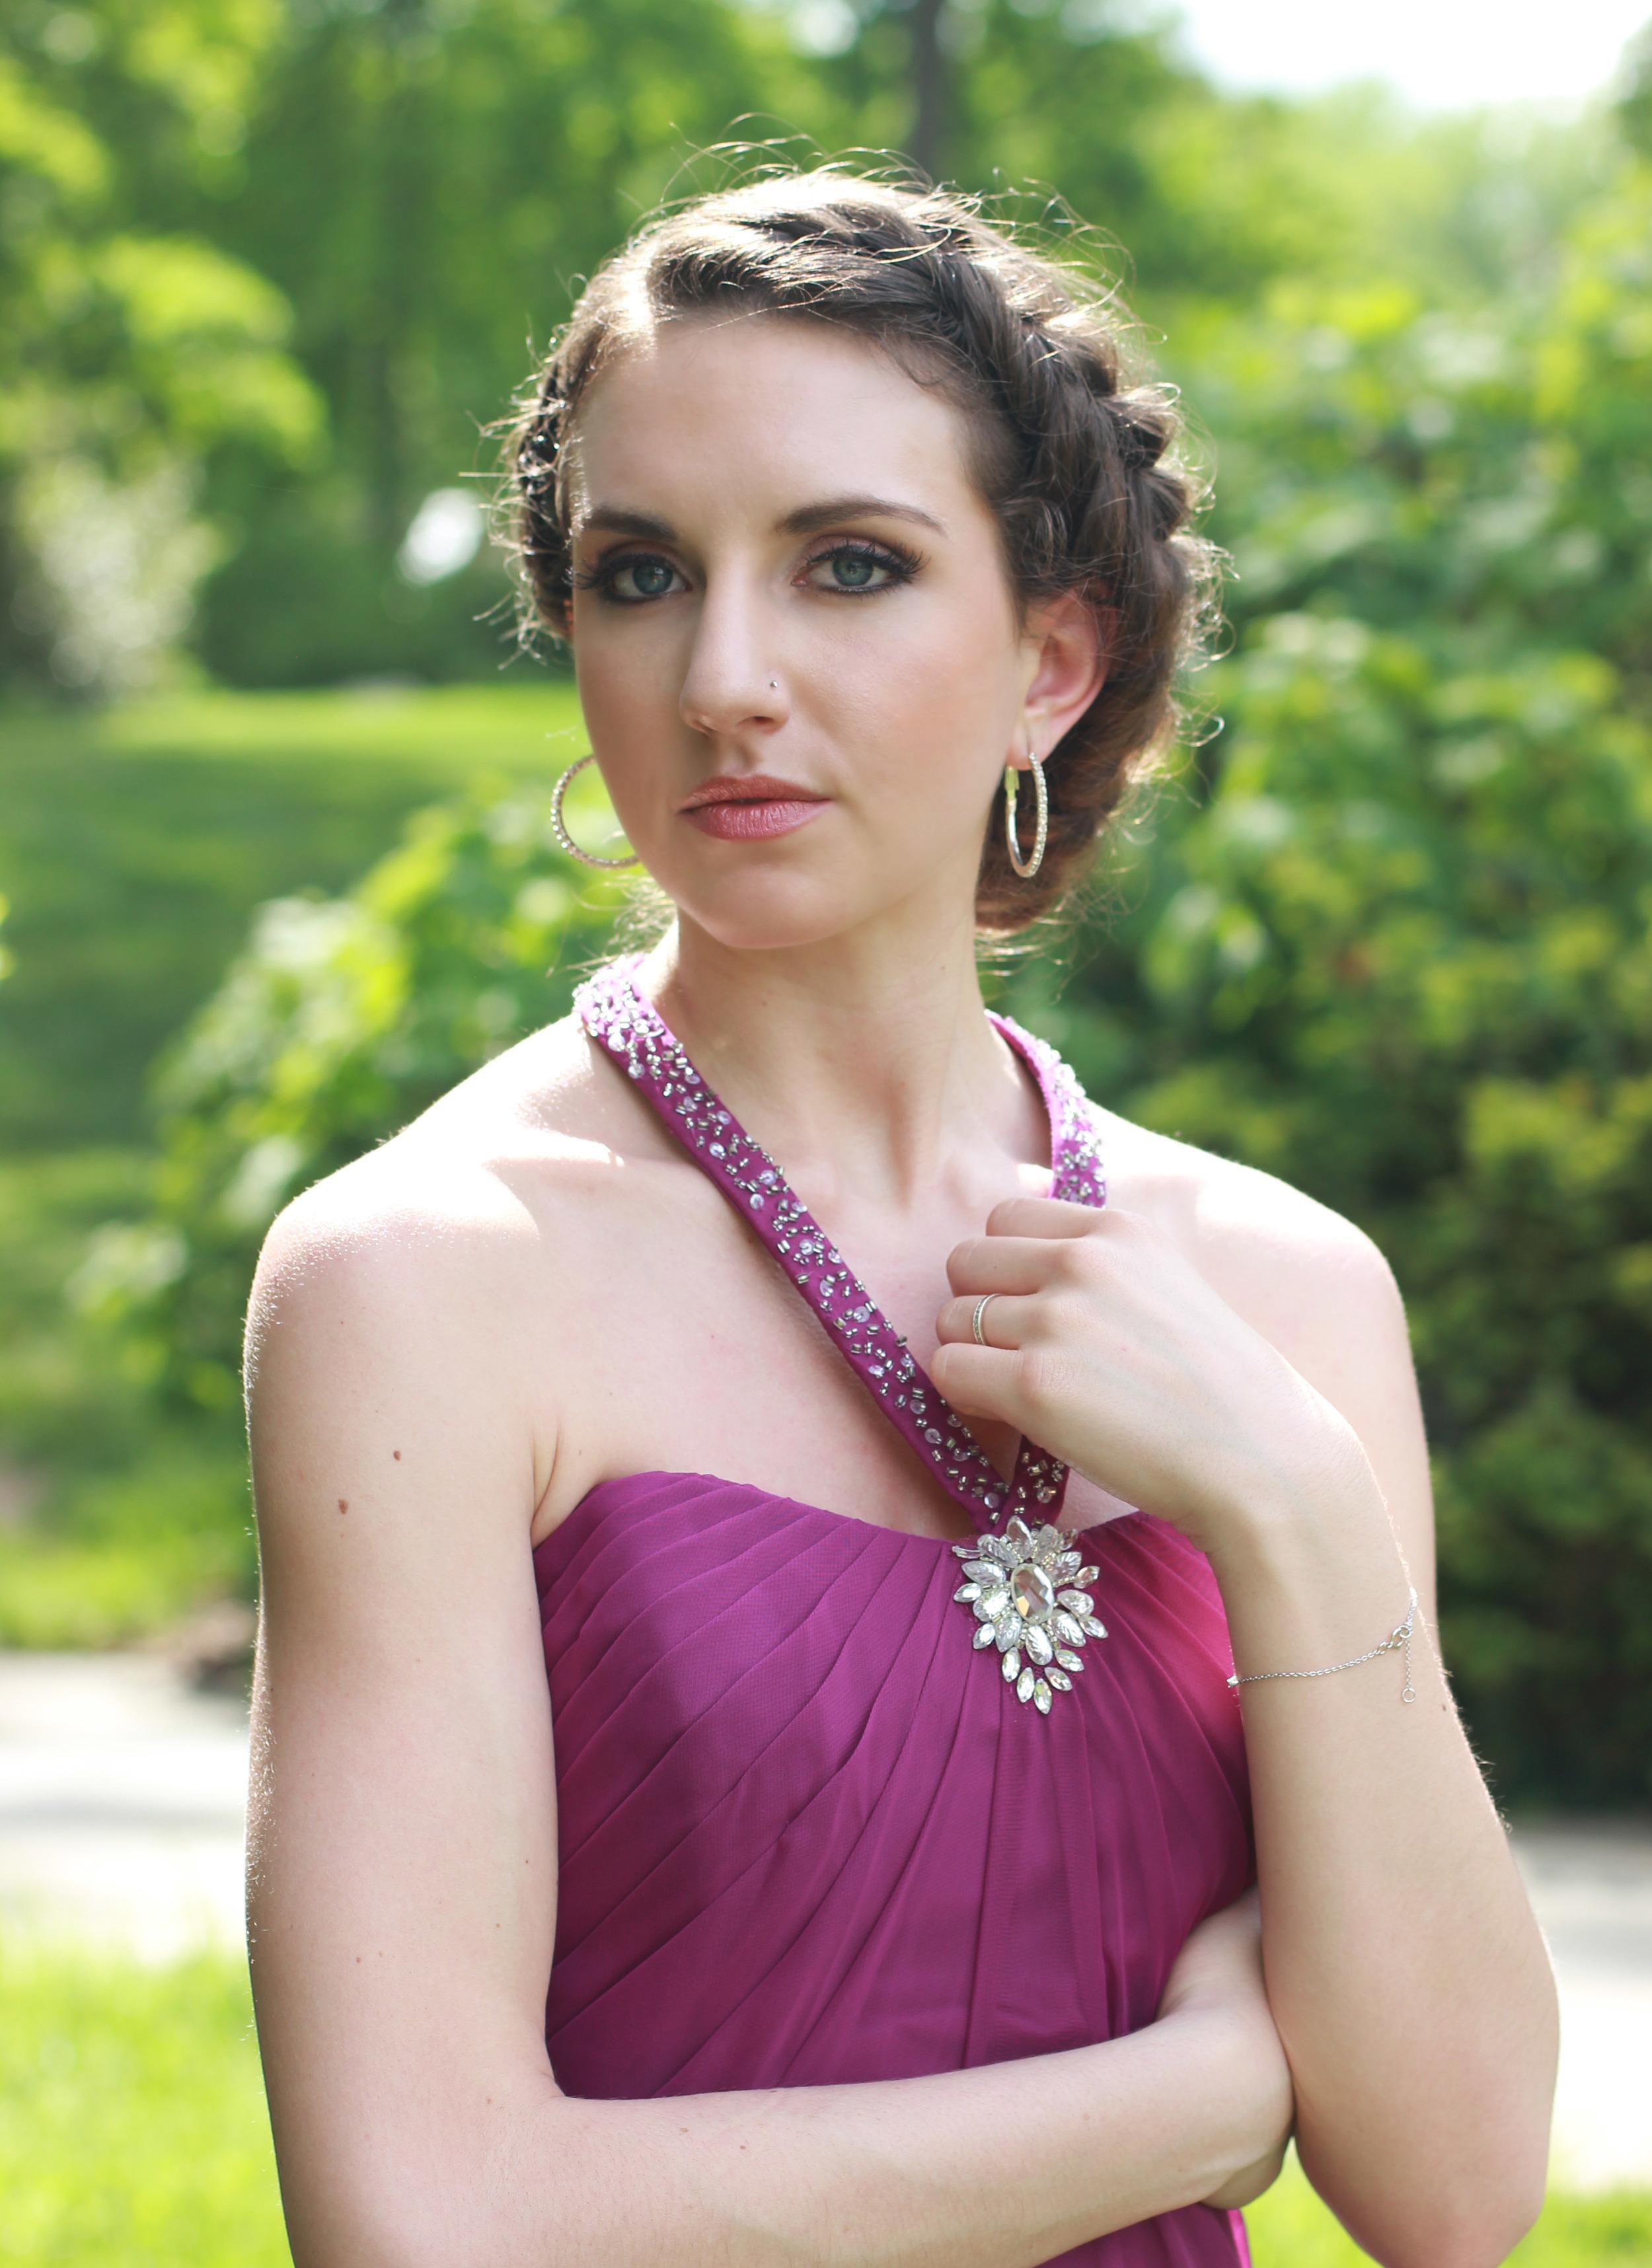 Bohemian Wedding | Bridesmaid | Brookside Gardens - Jess Rudolph Photography: www.jessrudolph.com